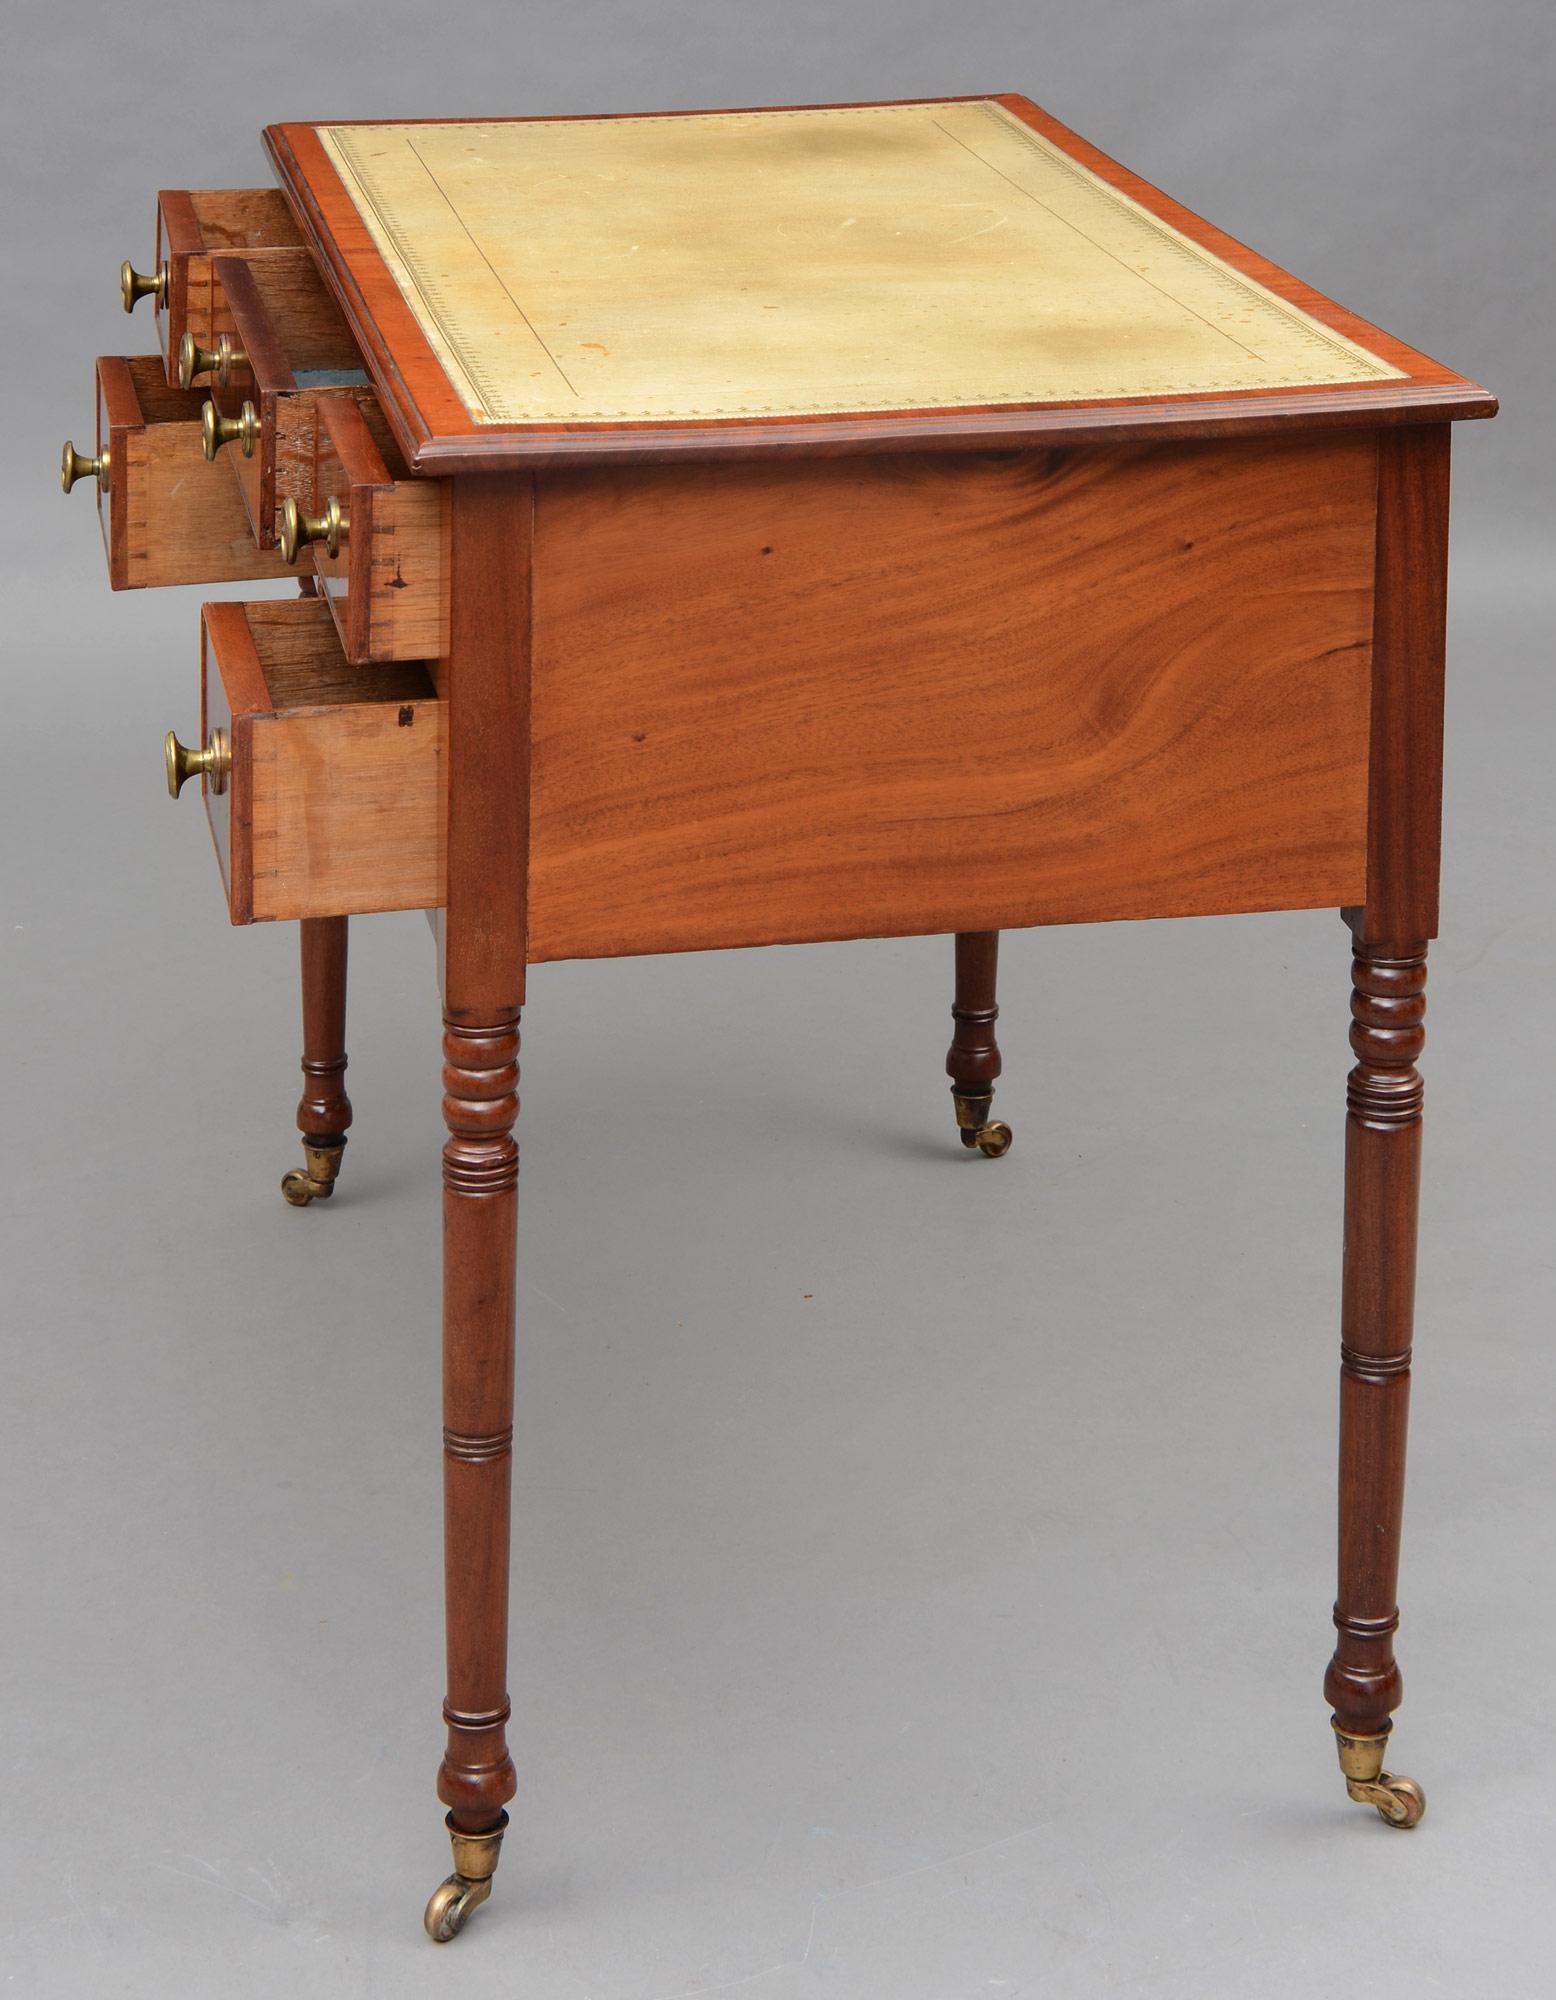 English Regency Mahogany Ladies Antique Writing Desk